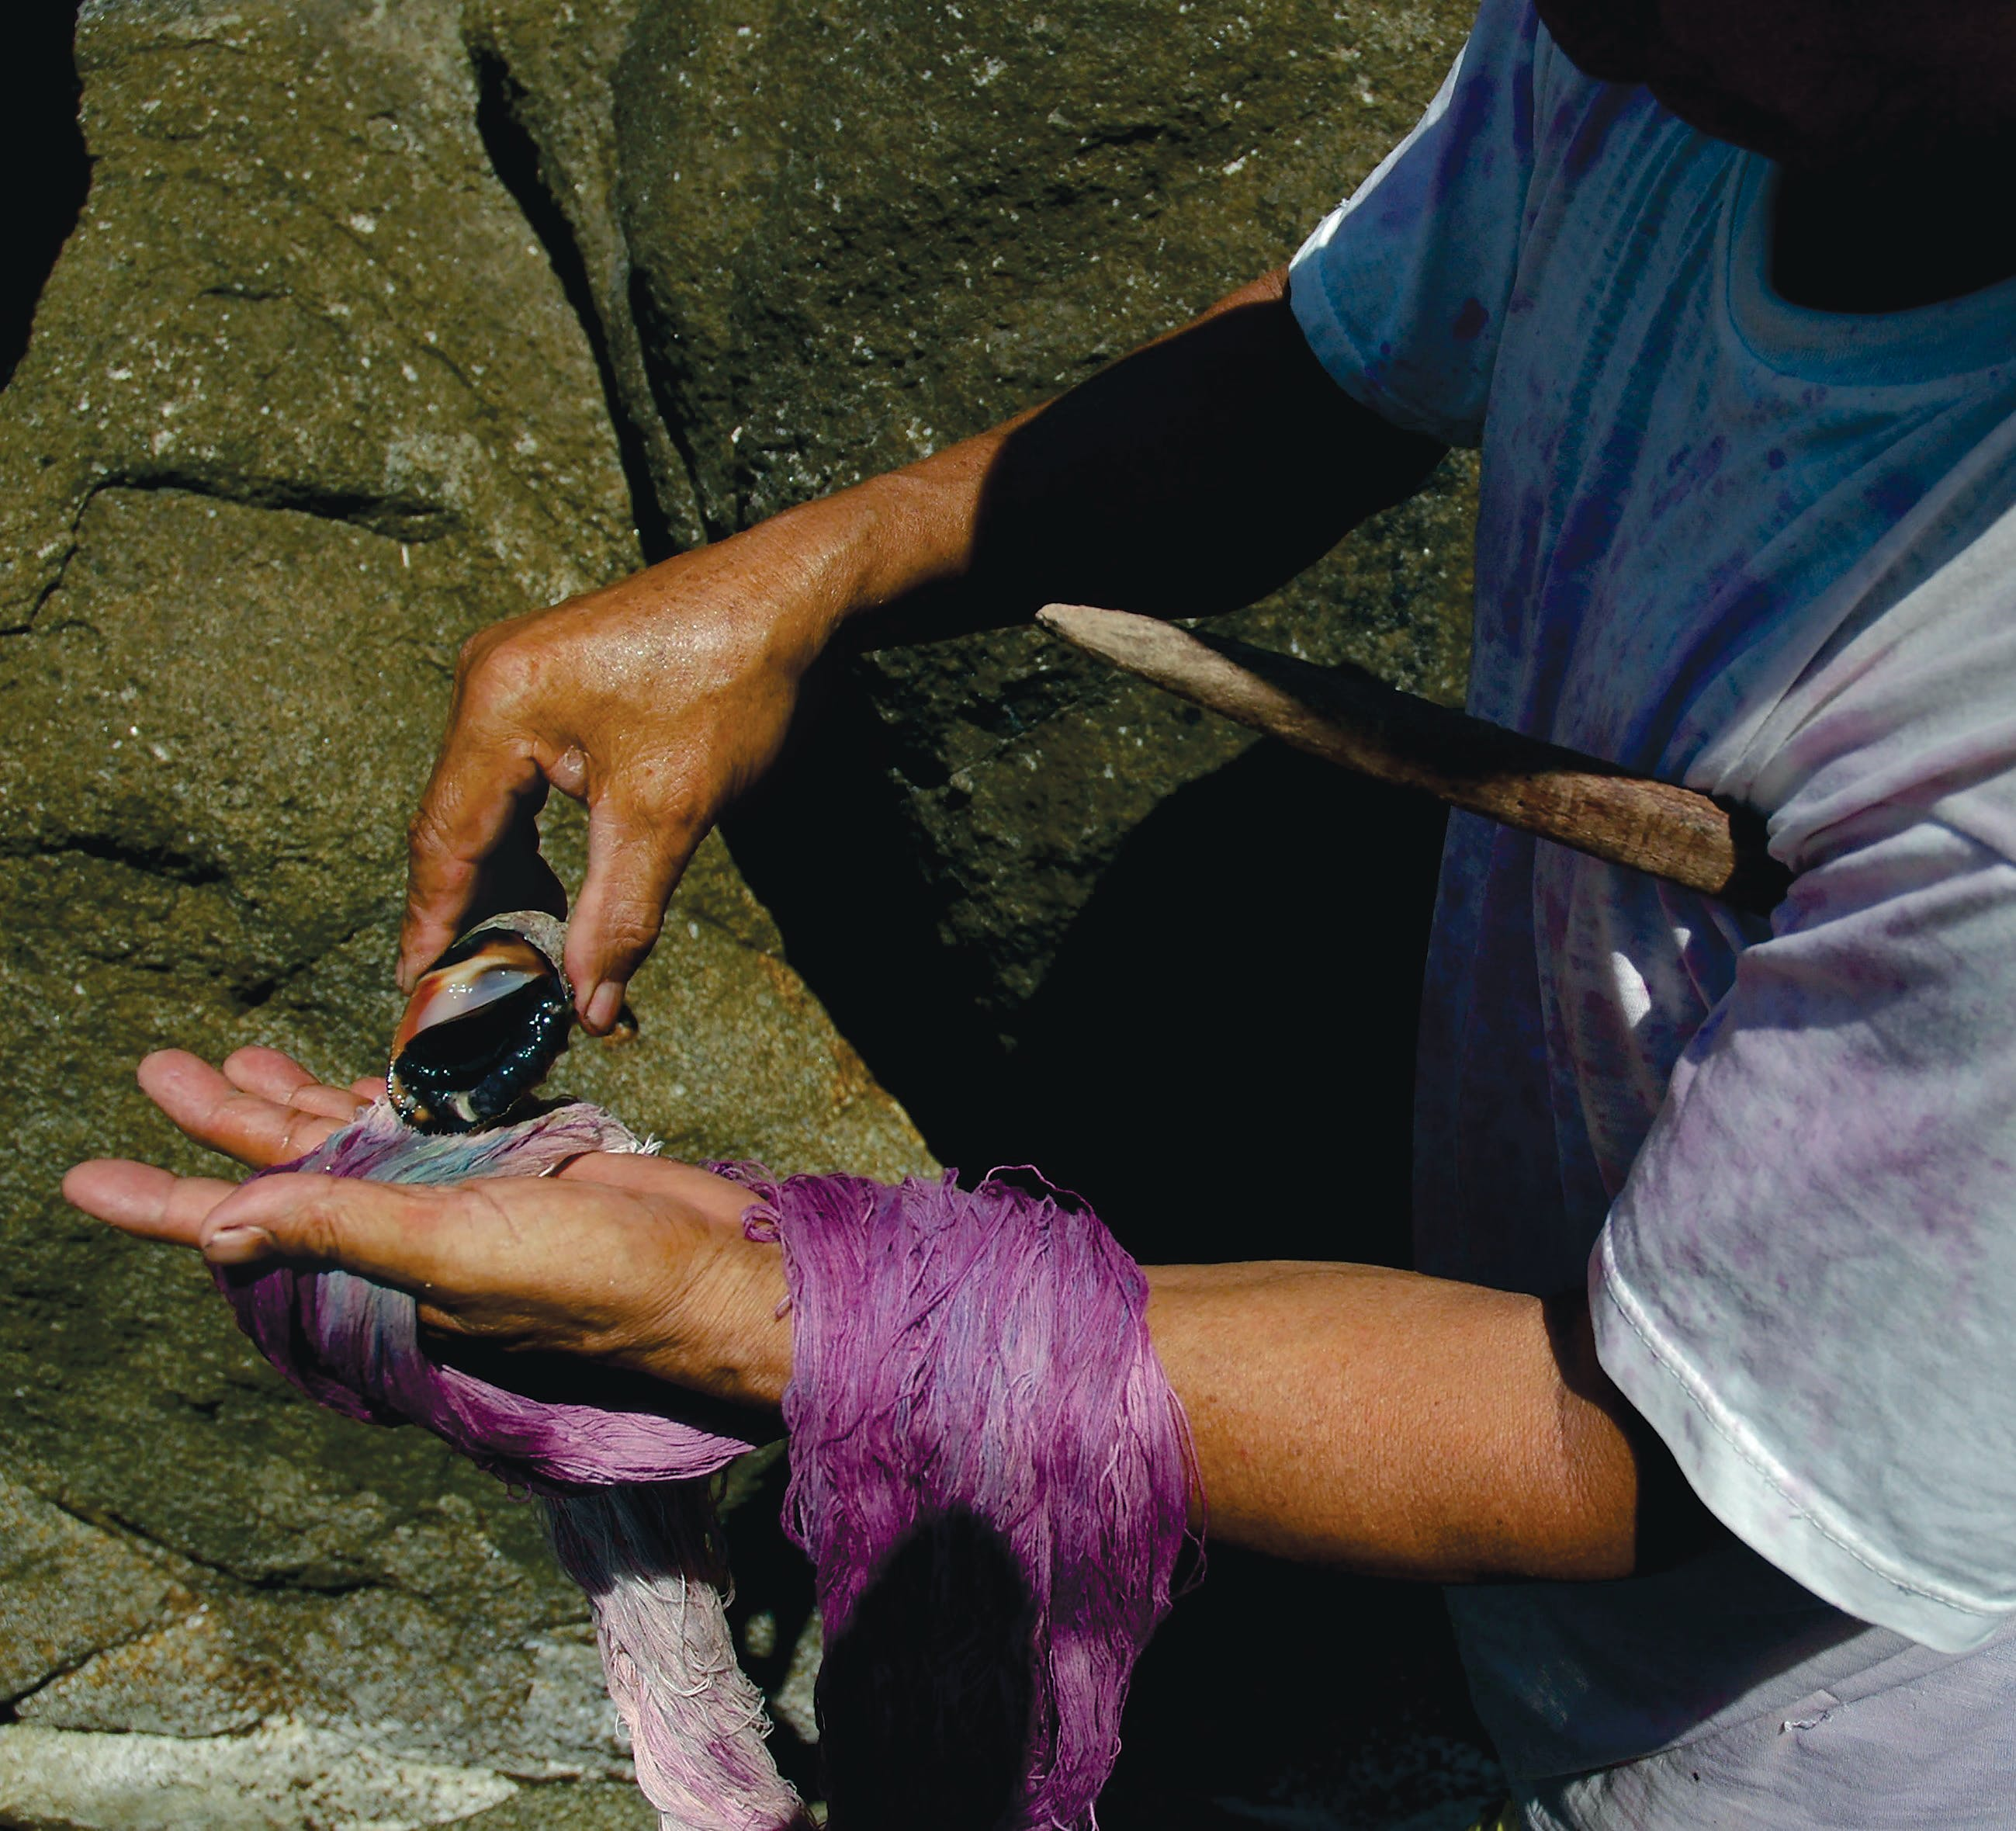 Mixtec dyer milking a sea snails for tixinda